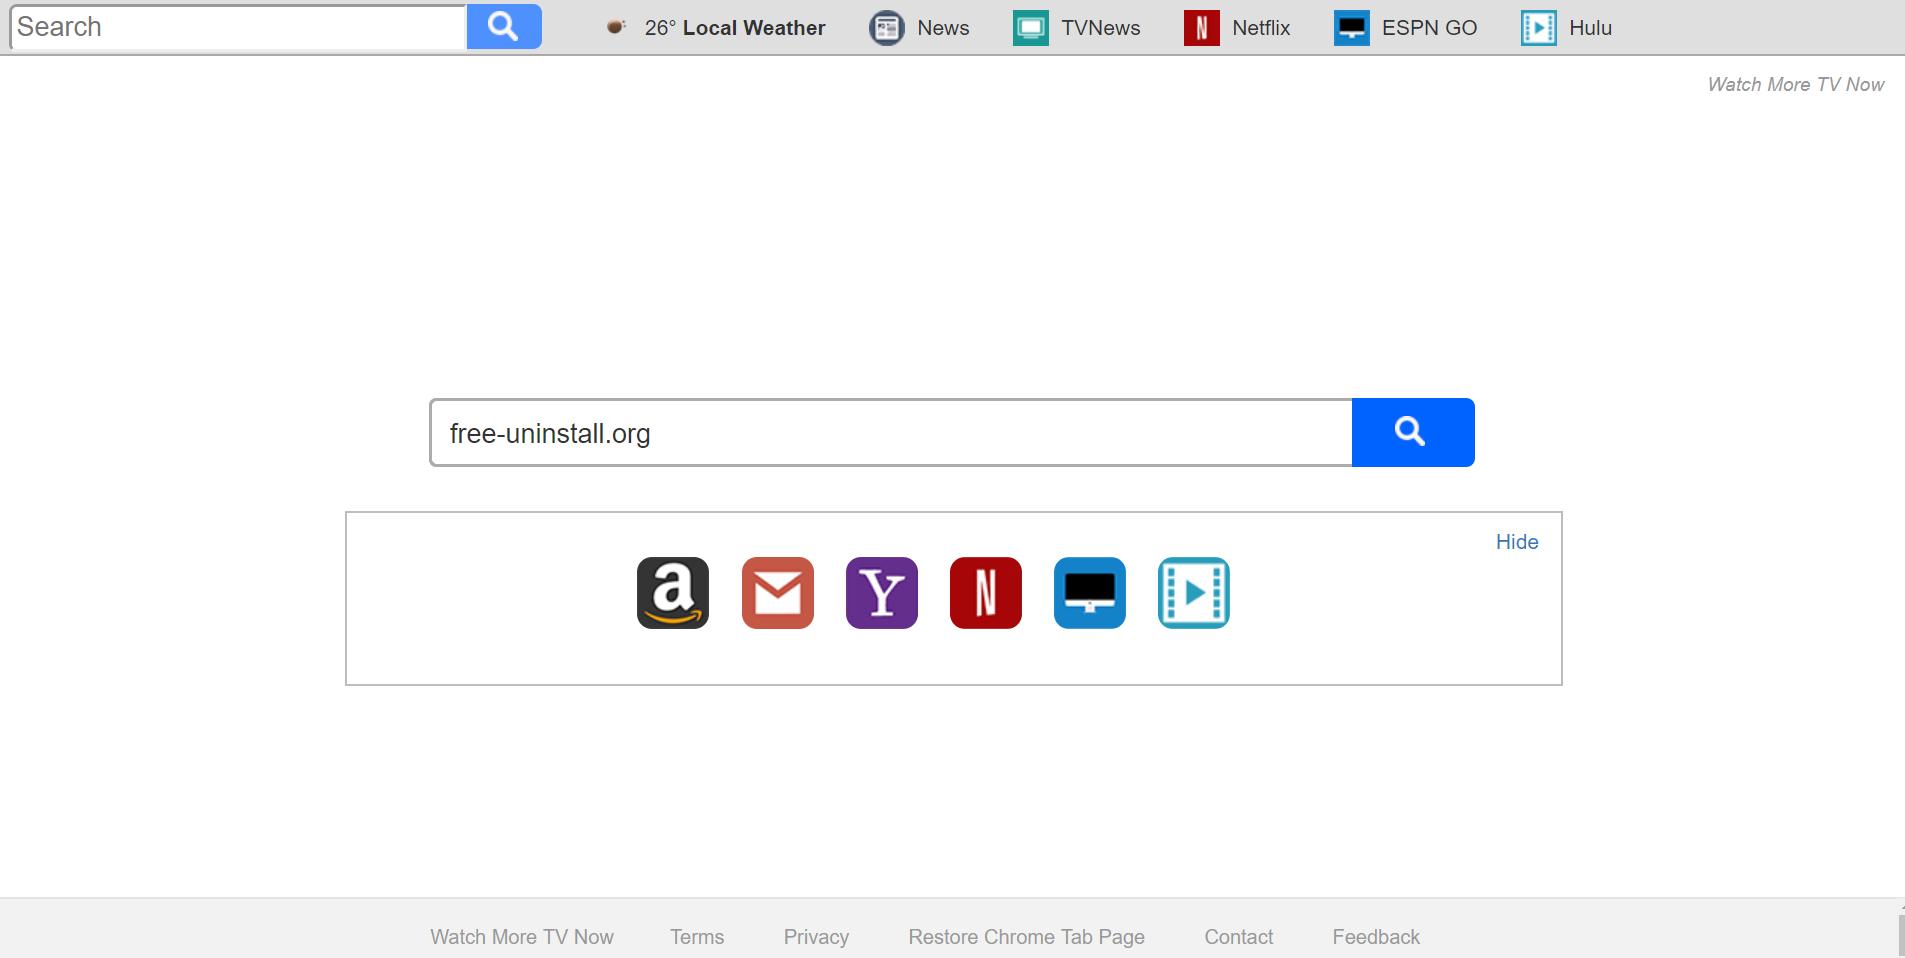 Search.searchwmtn.com Hijacker